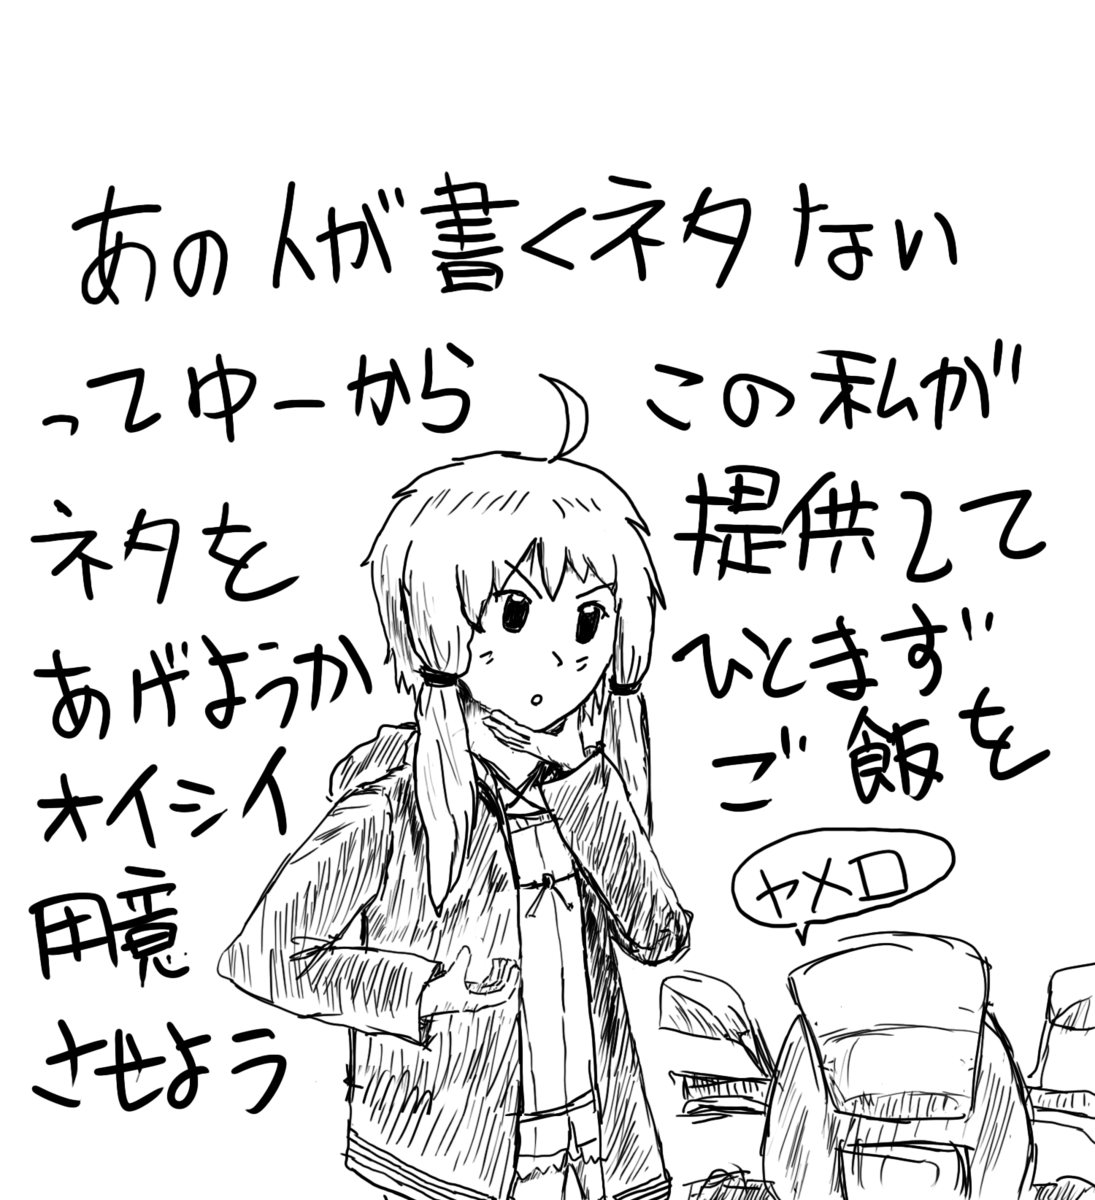 f:id:zomuzomu:20191002215735p:plain